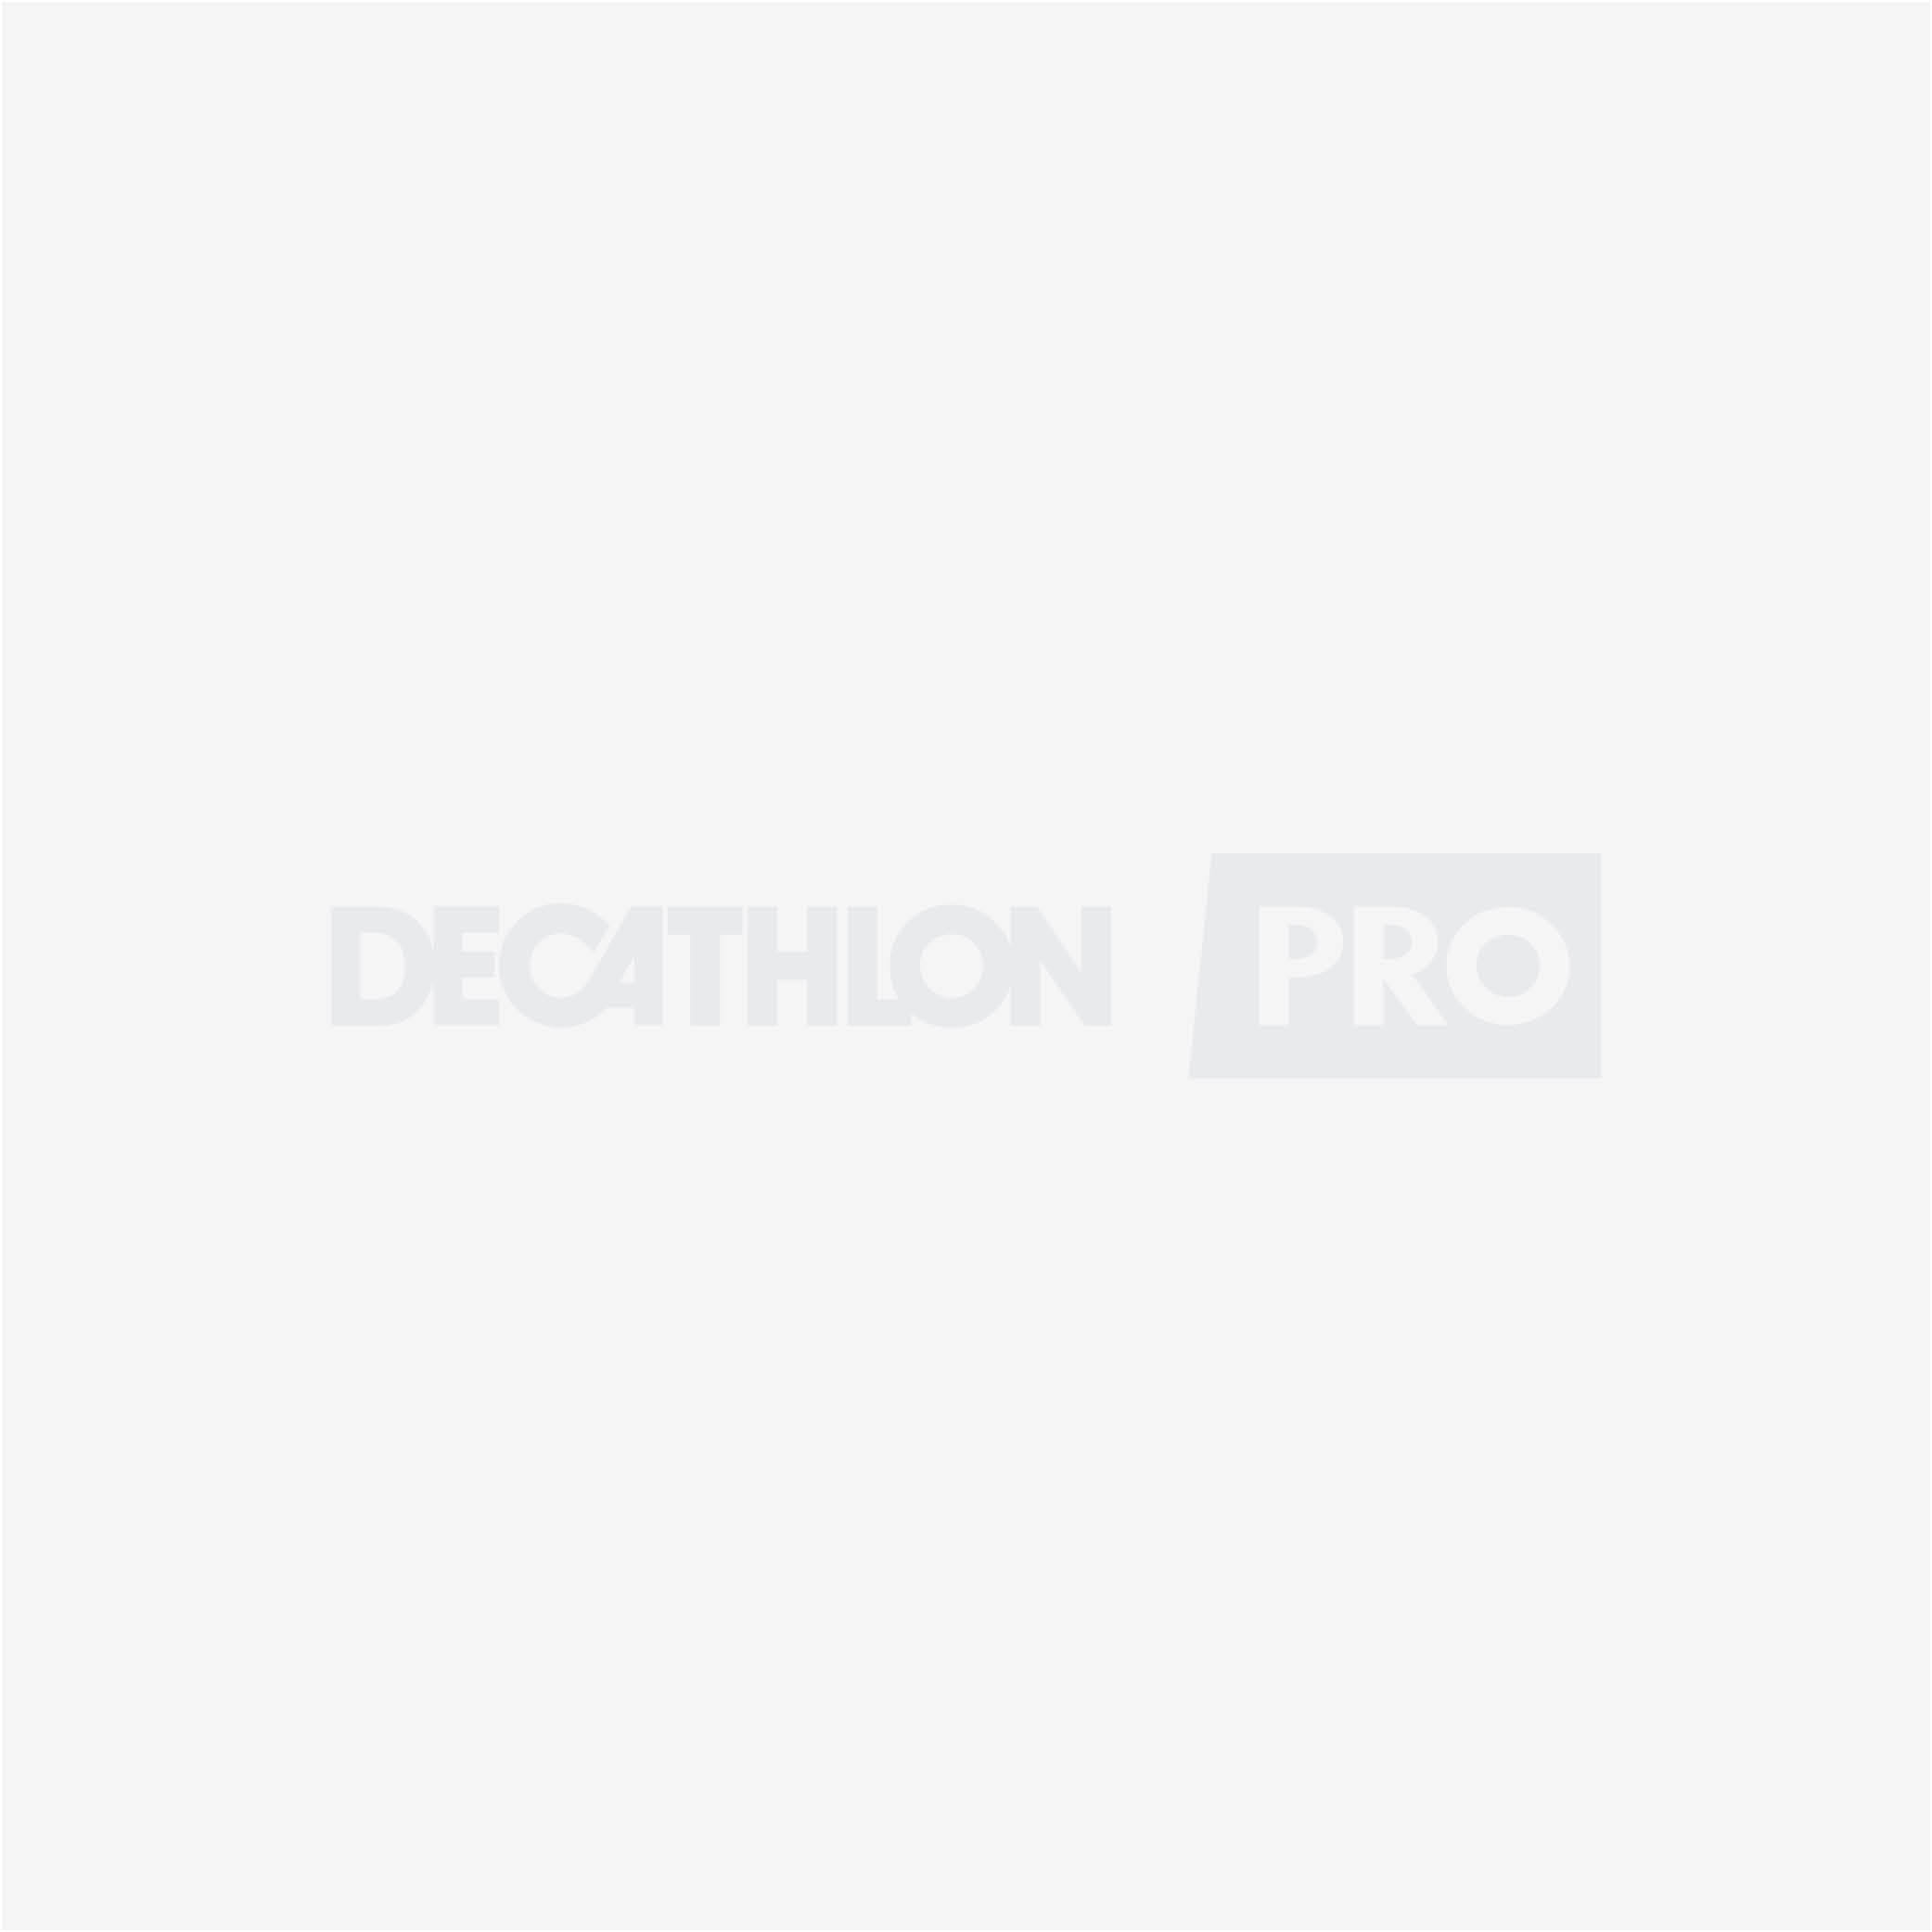 LinkedIn Decathlon Pro